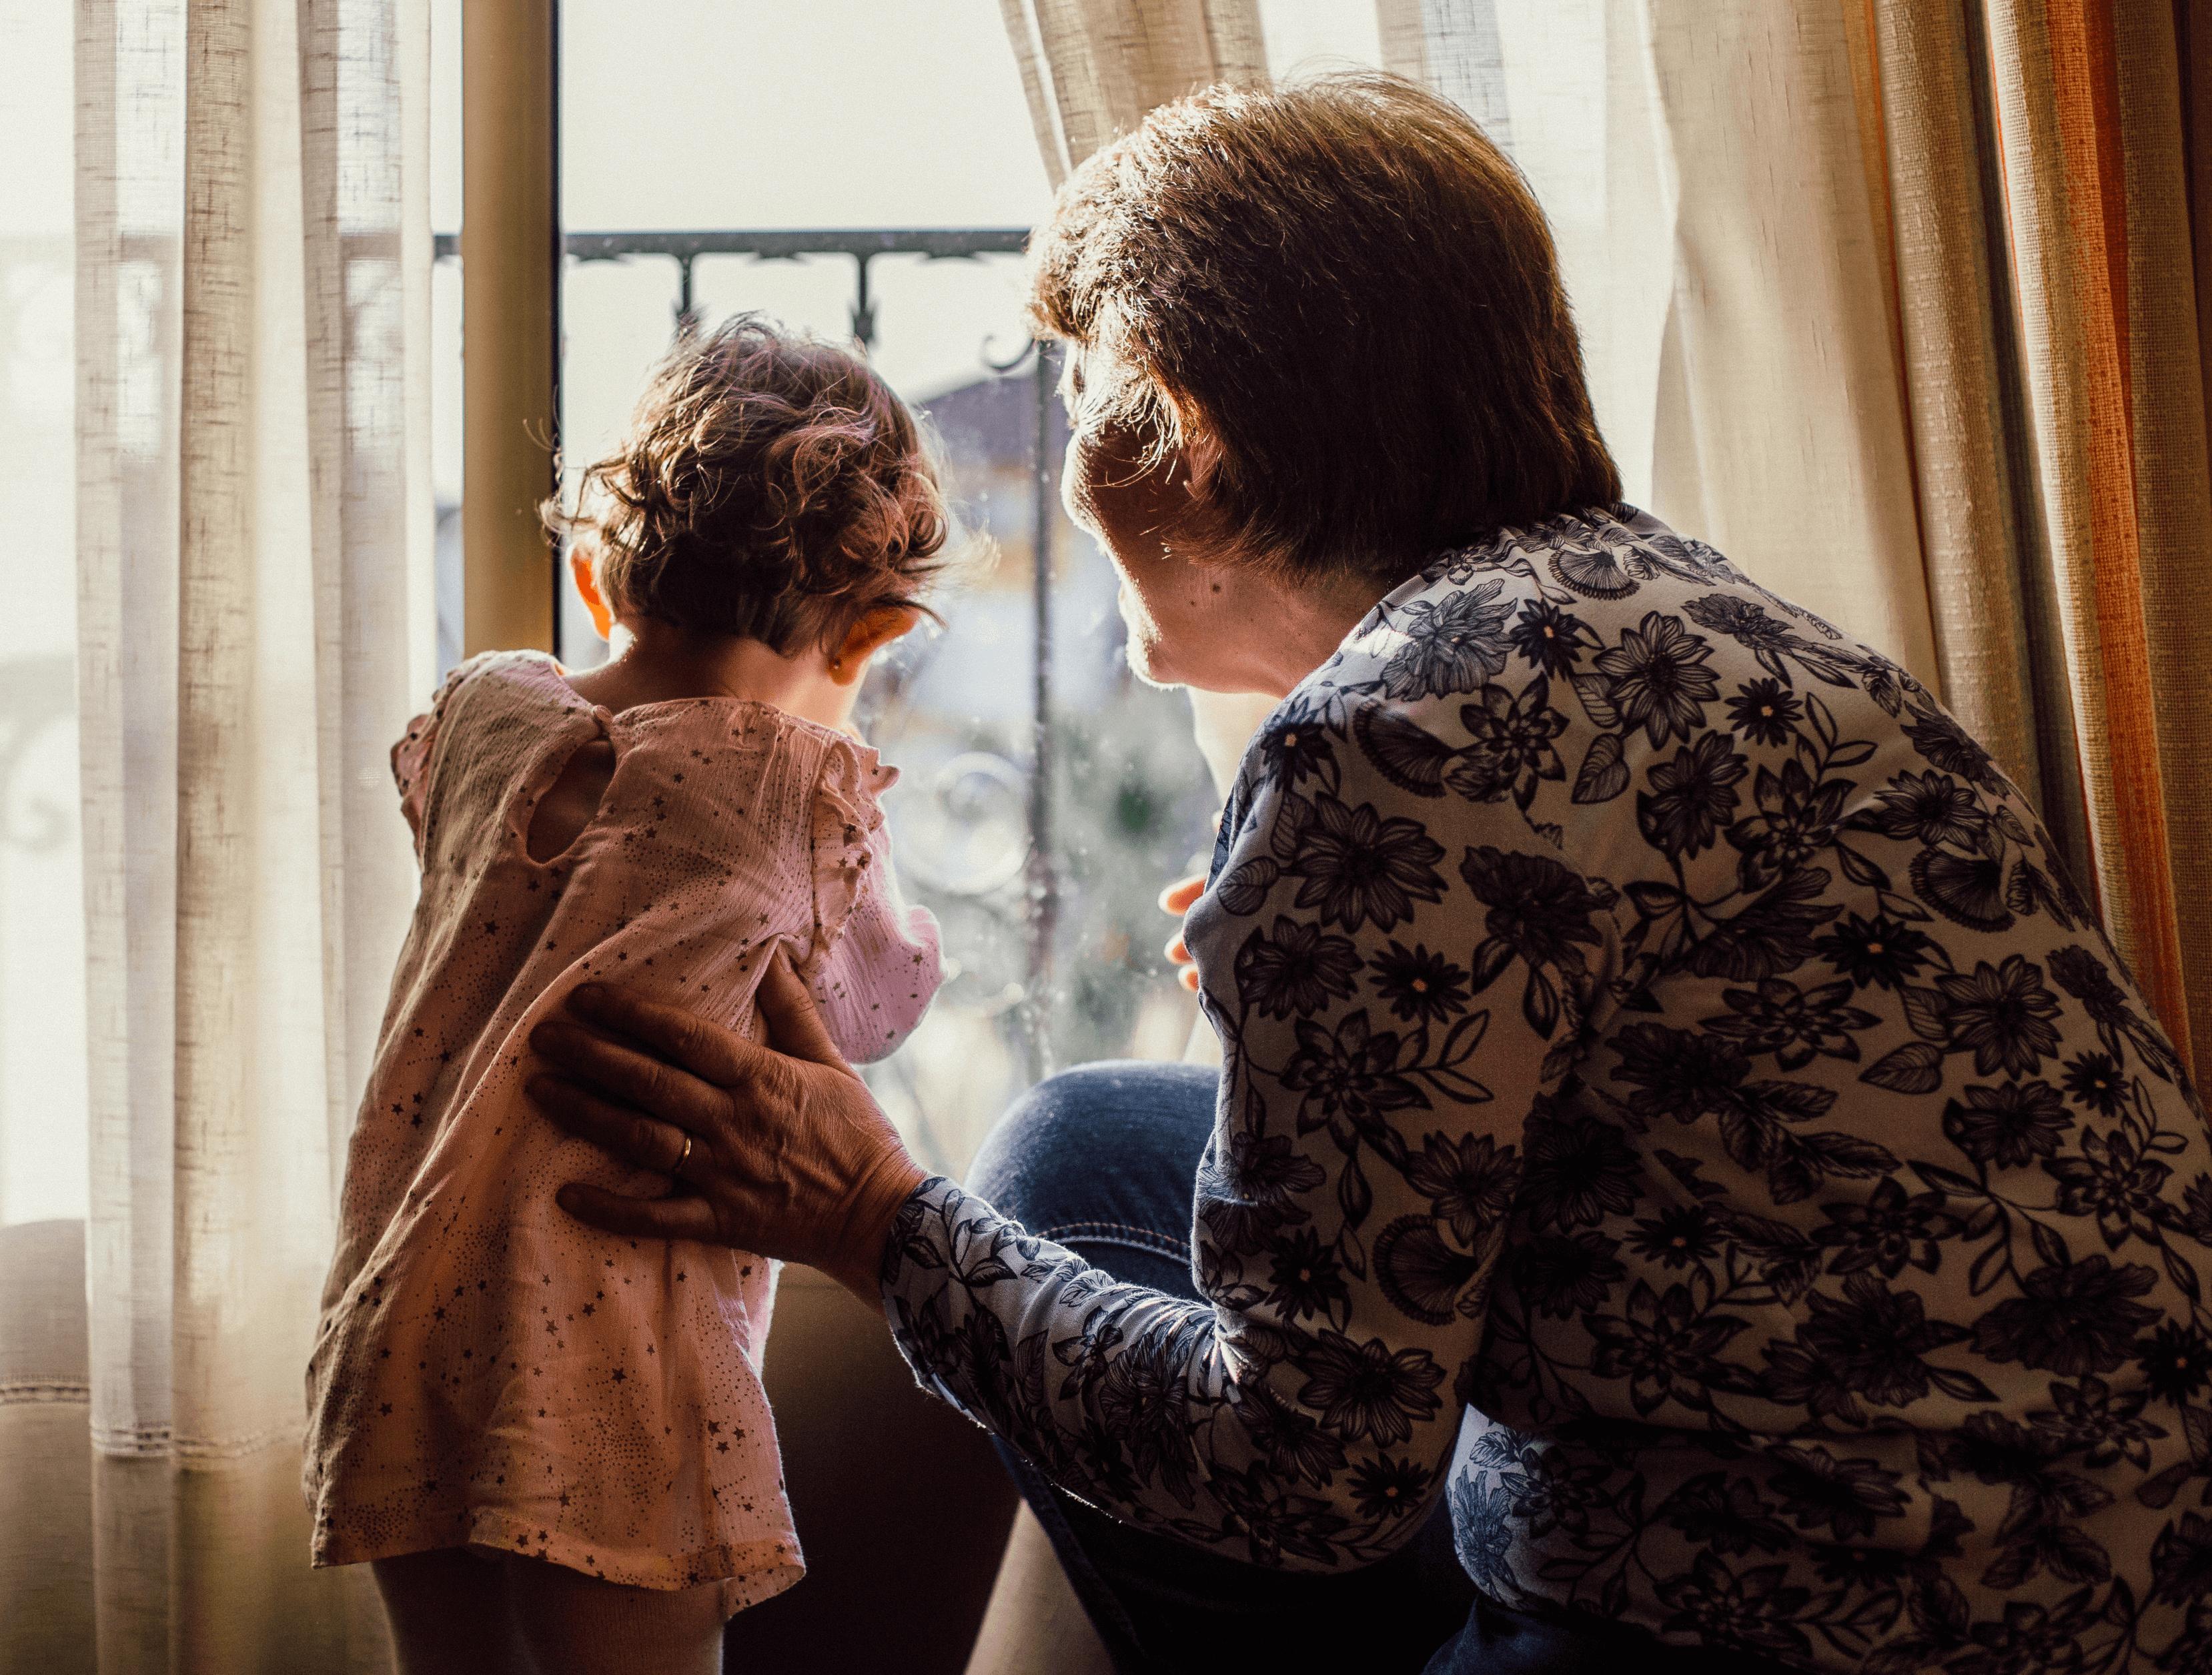 Grandparent holding child near window